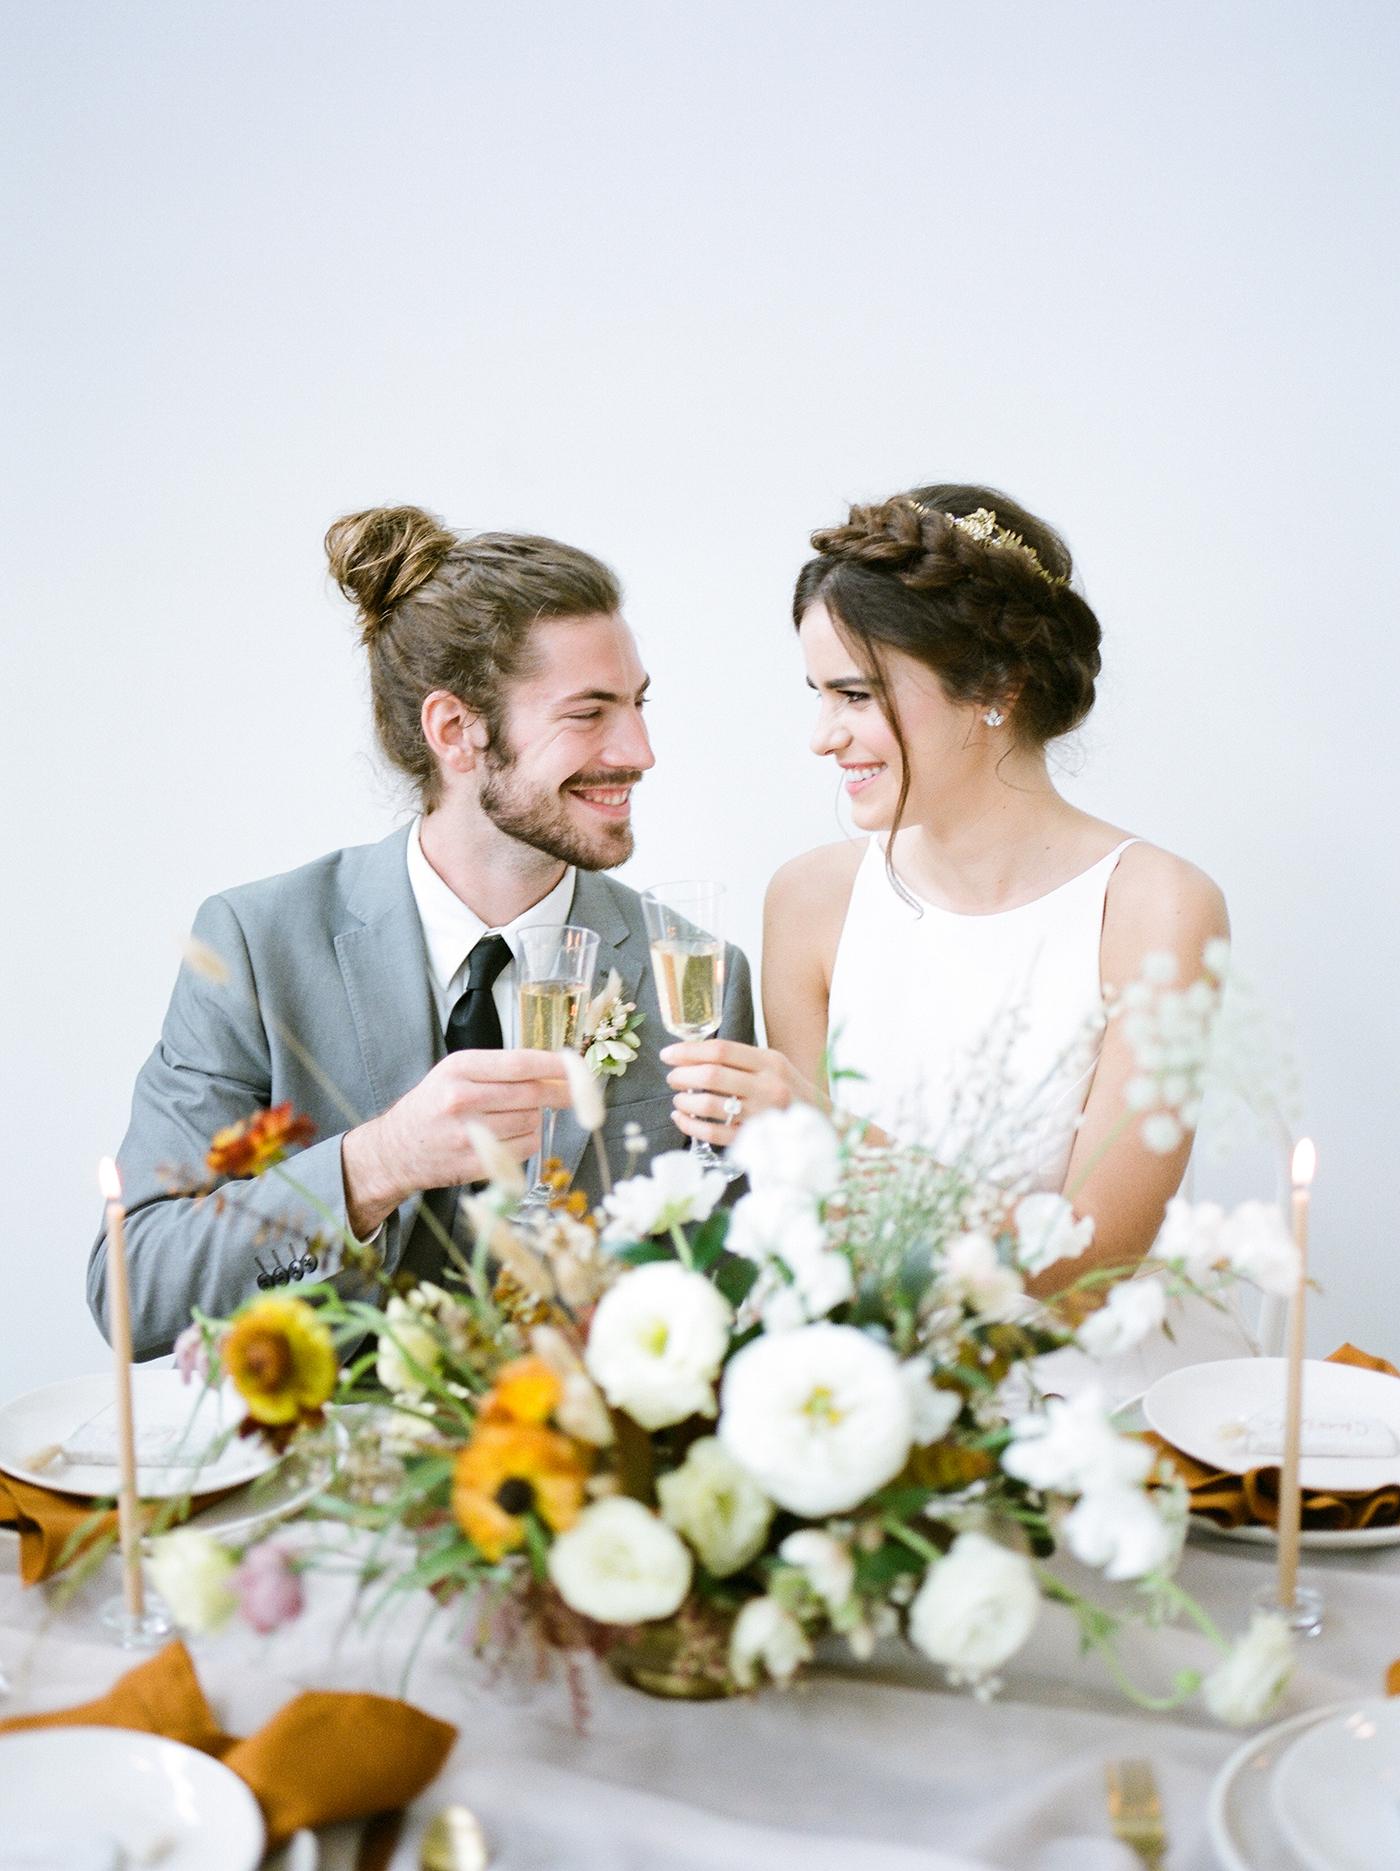 Wedding Floral Design Dallas - Olive Grove Design - Mimimalist Fall Wedding - 00071.jpg